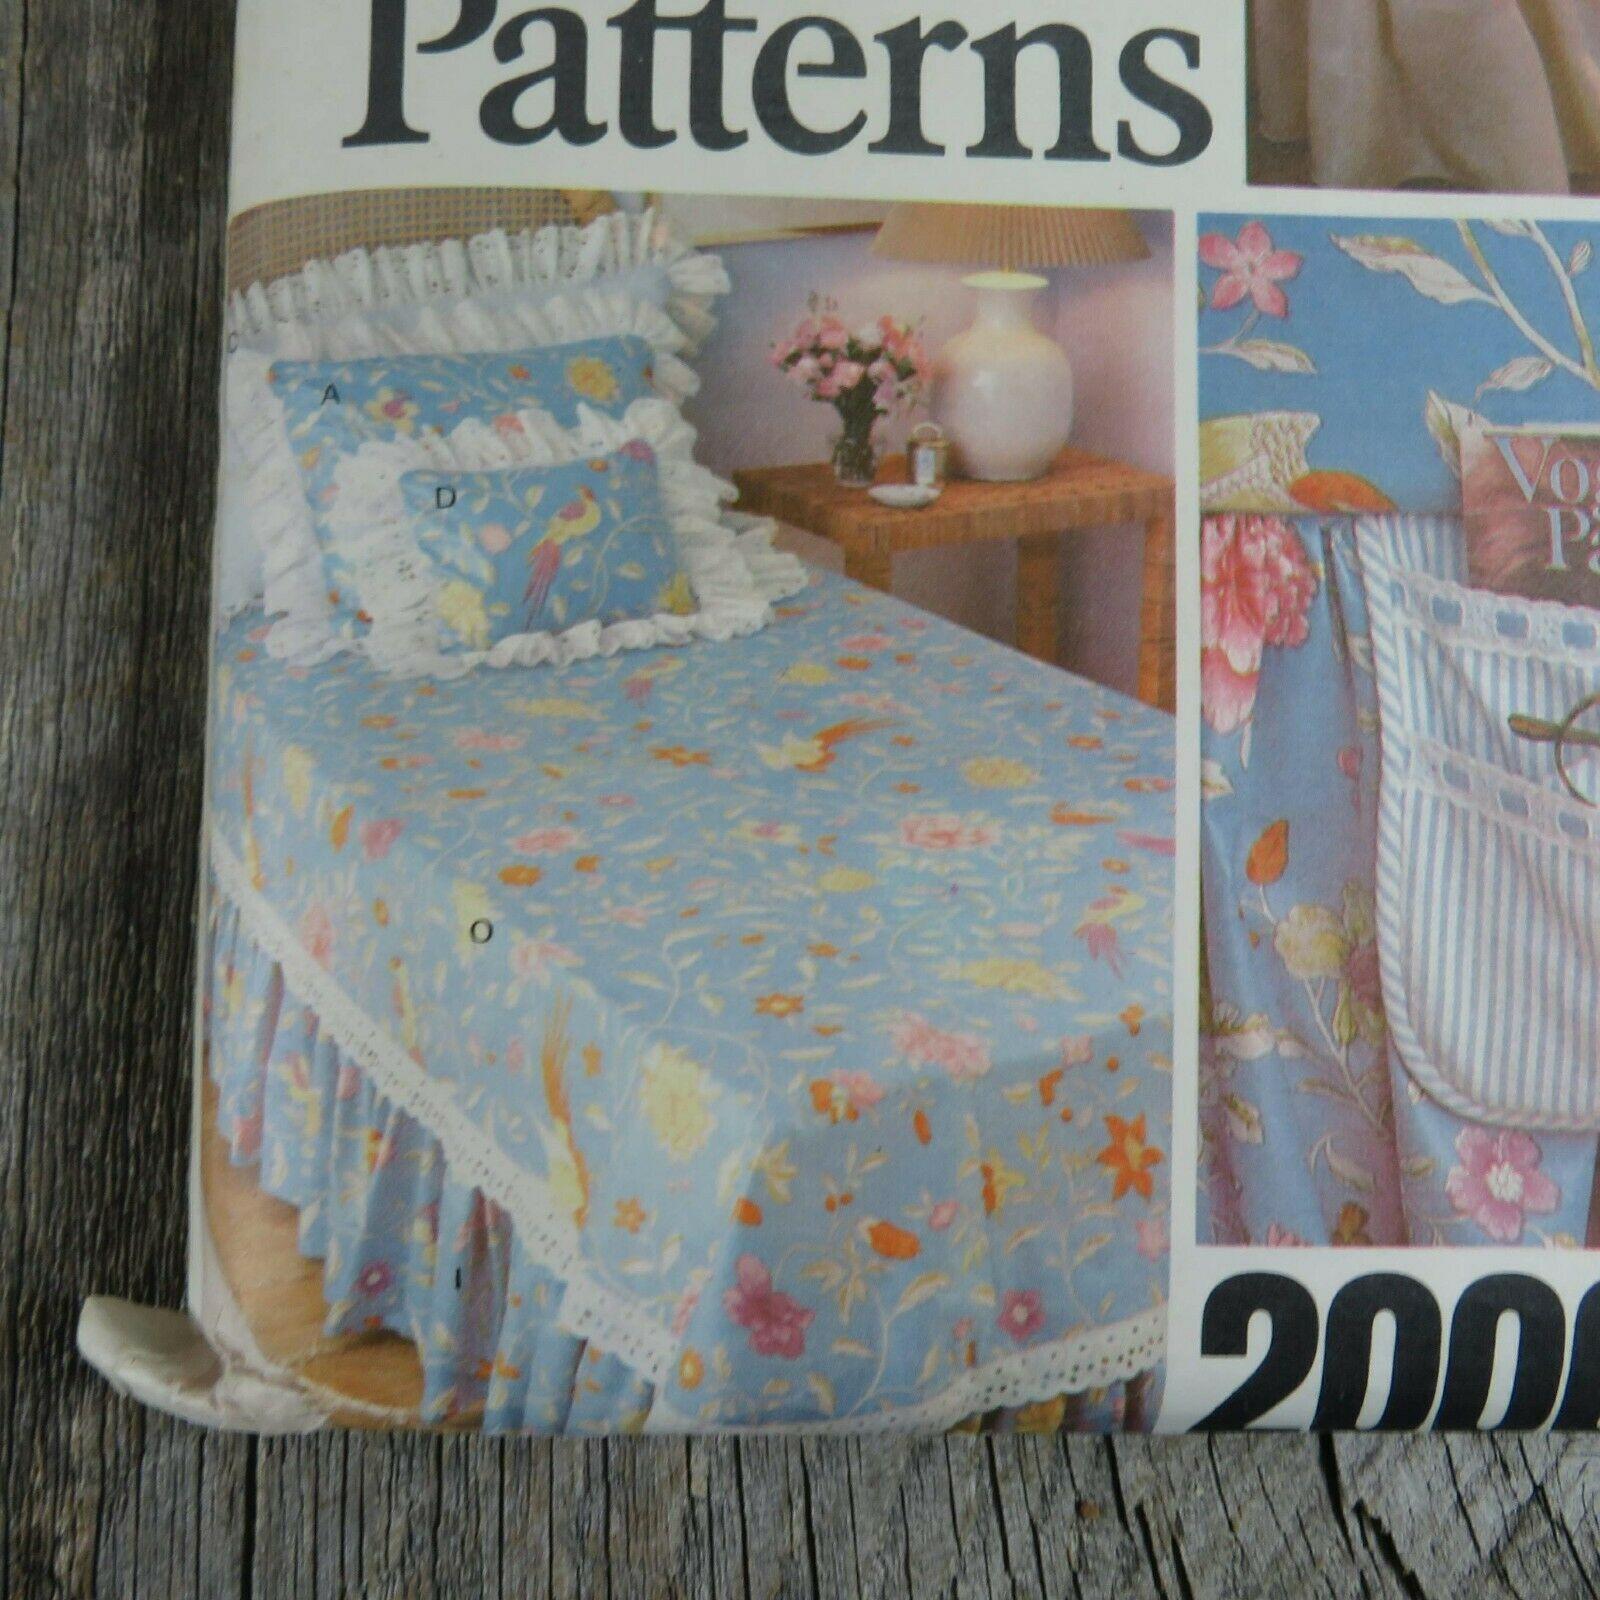 Vintage Vogue Bedspread Linen Sewing Pattern Bedroom Sham Pillow Bed Covers image 5